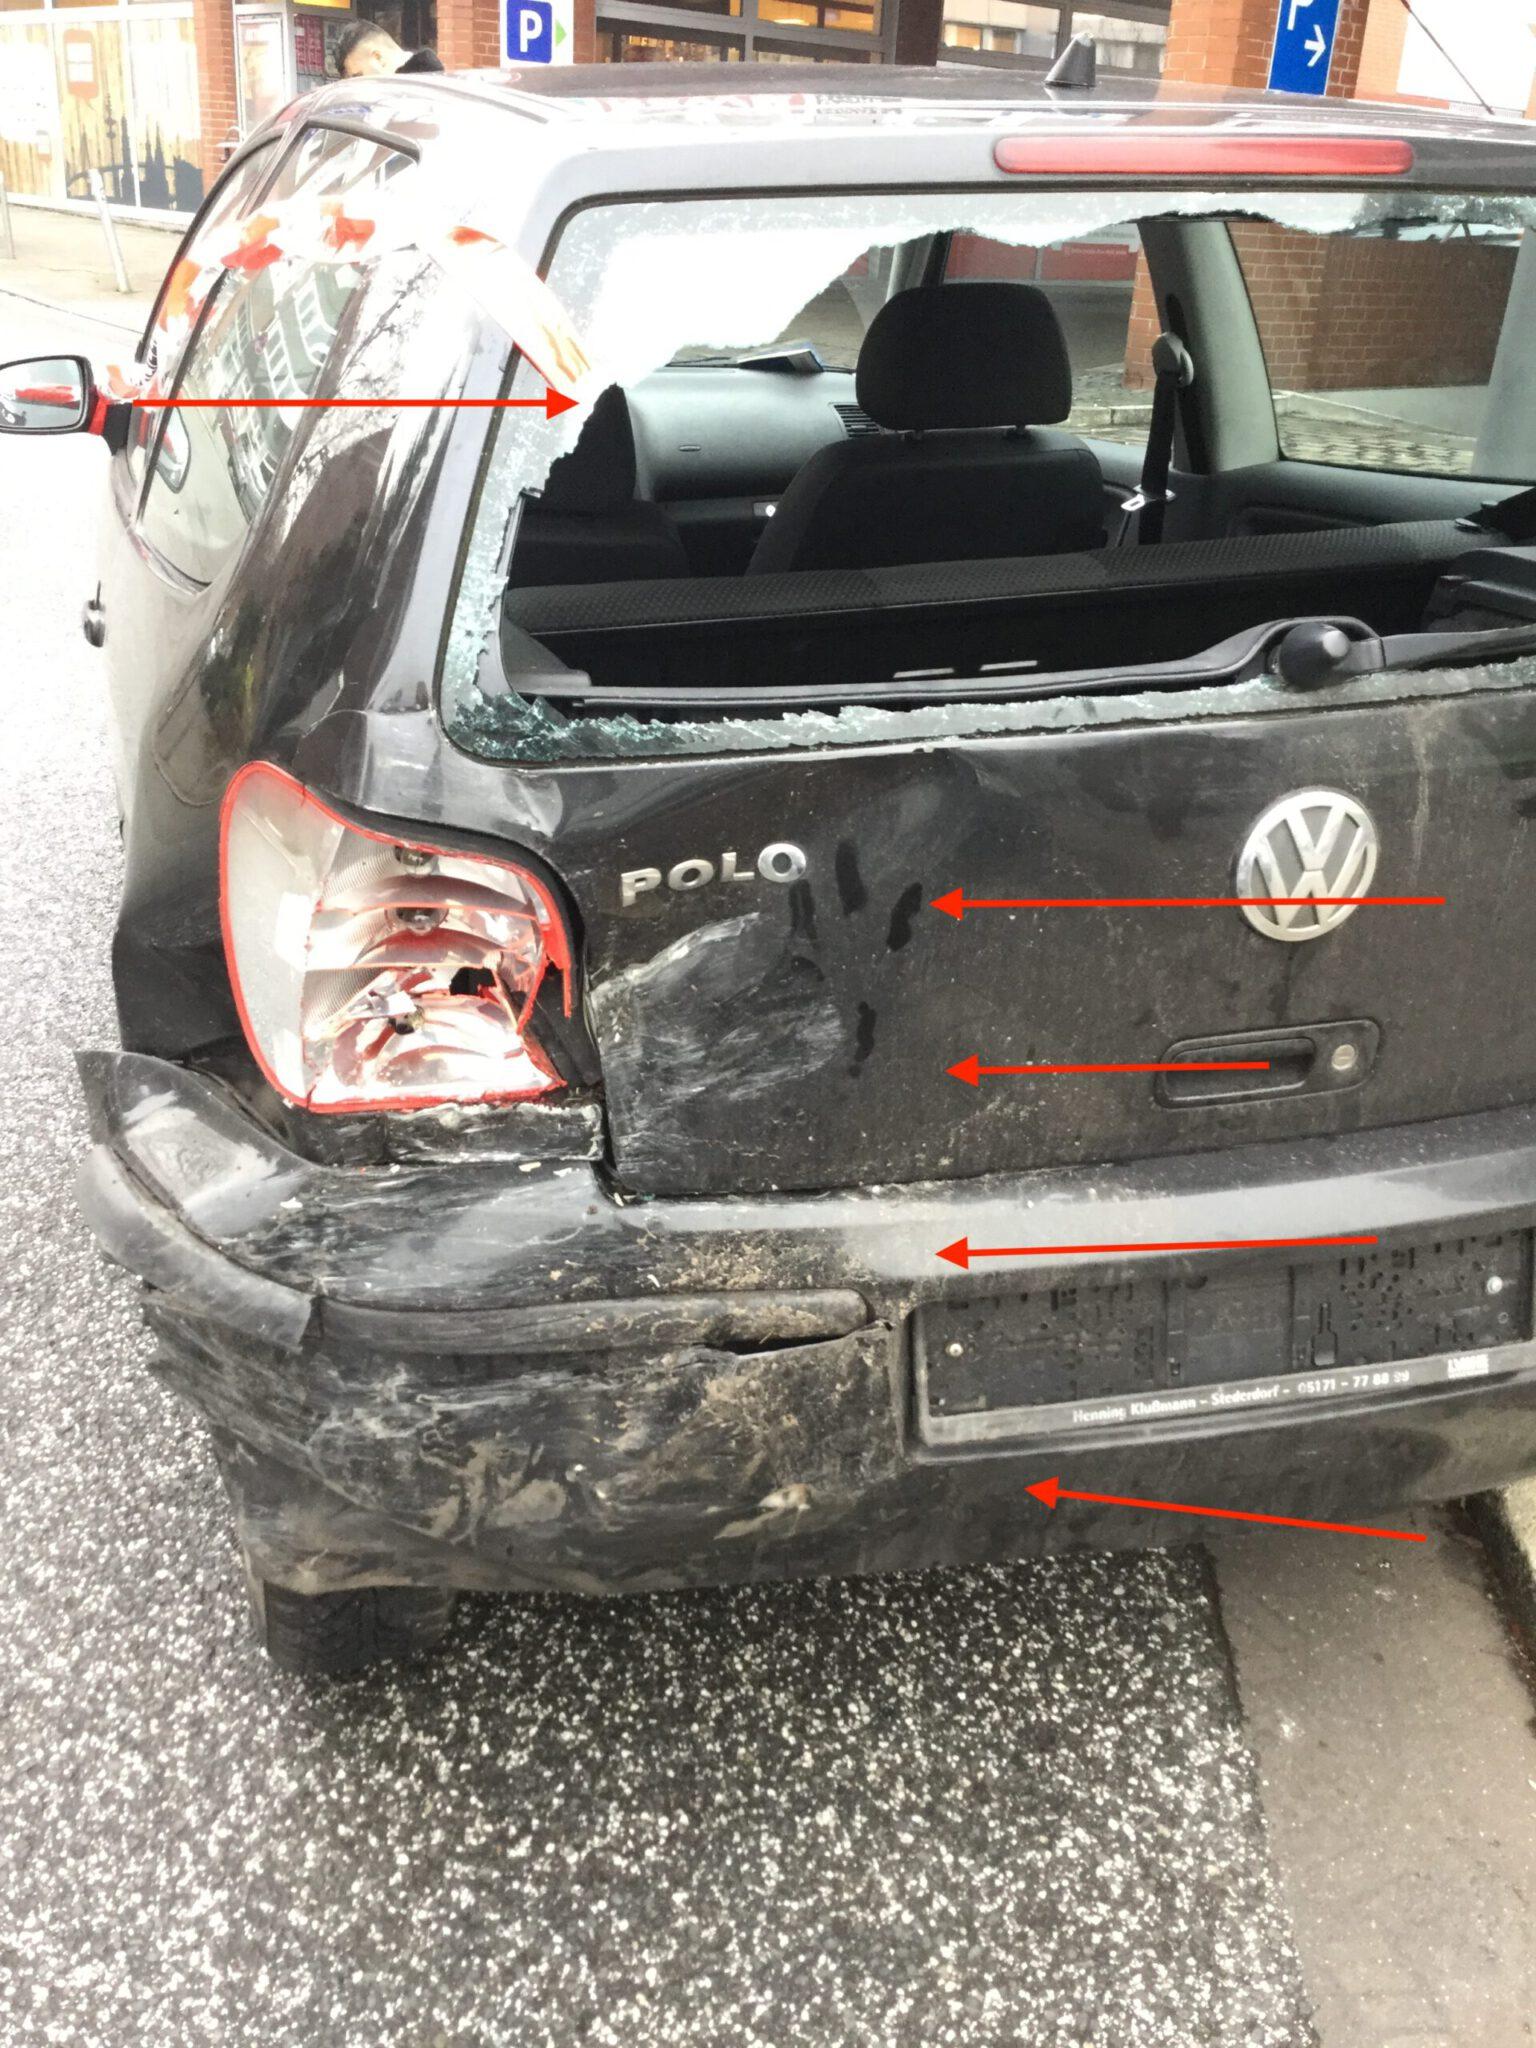 Kfz Gutachter Hamburg Polo Totalschaden